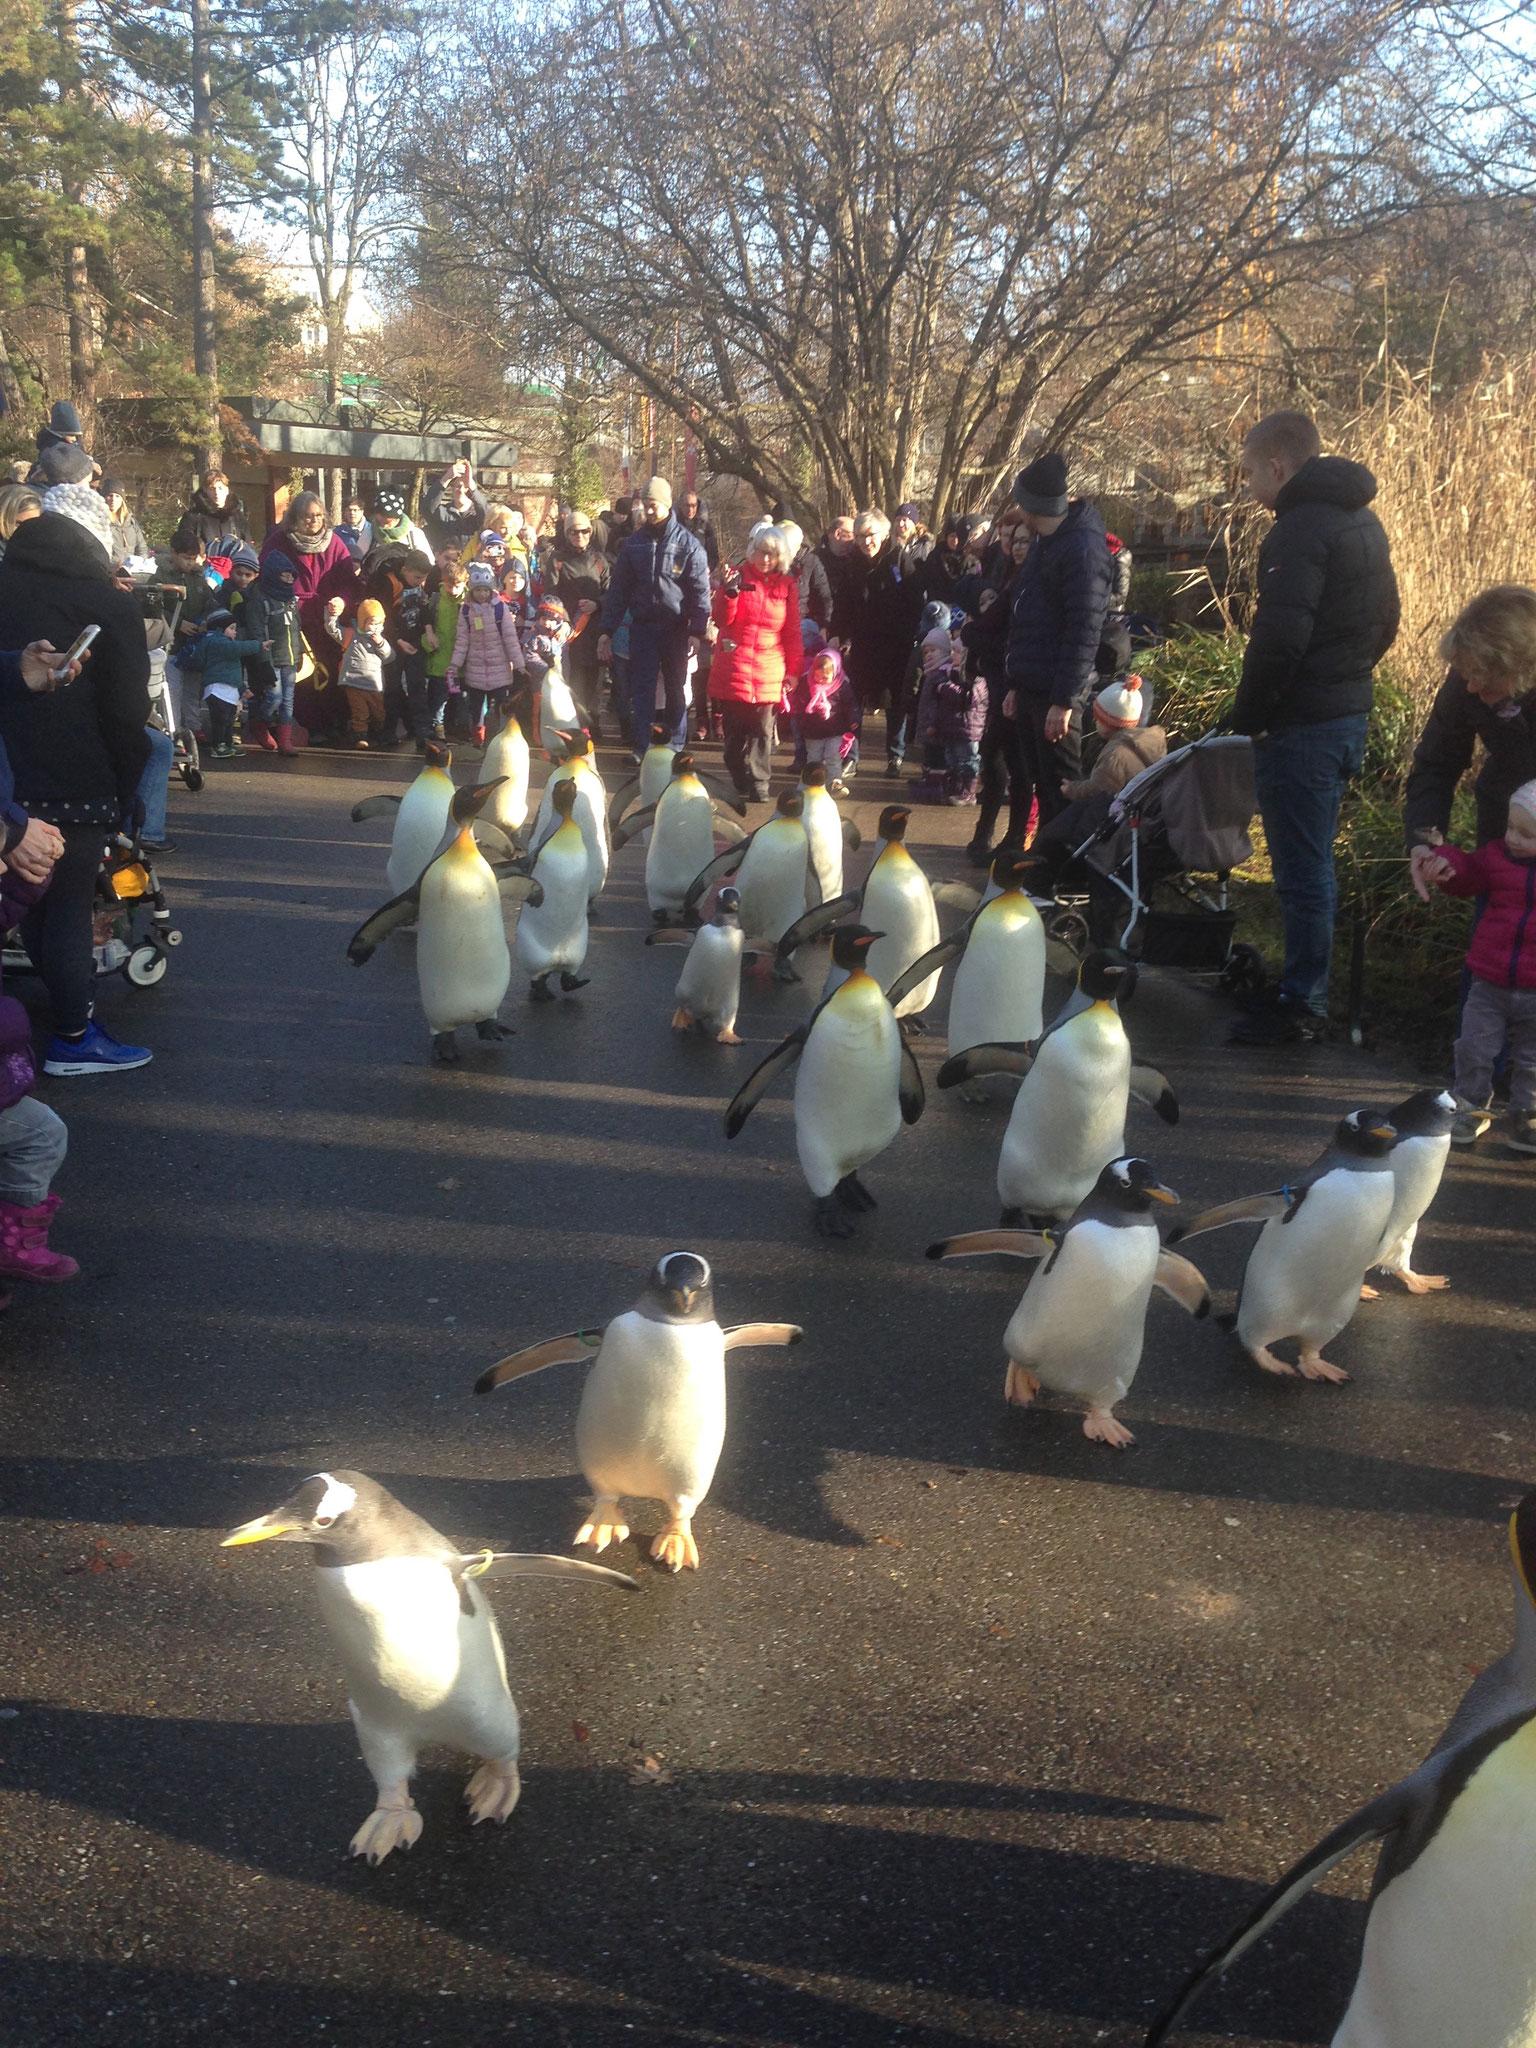 Pinguinwanderung im Zoo Basel (15.01.2019)